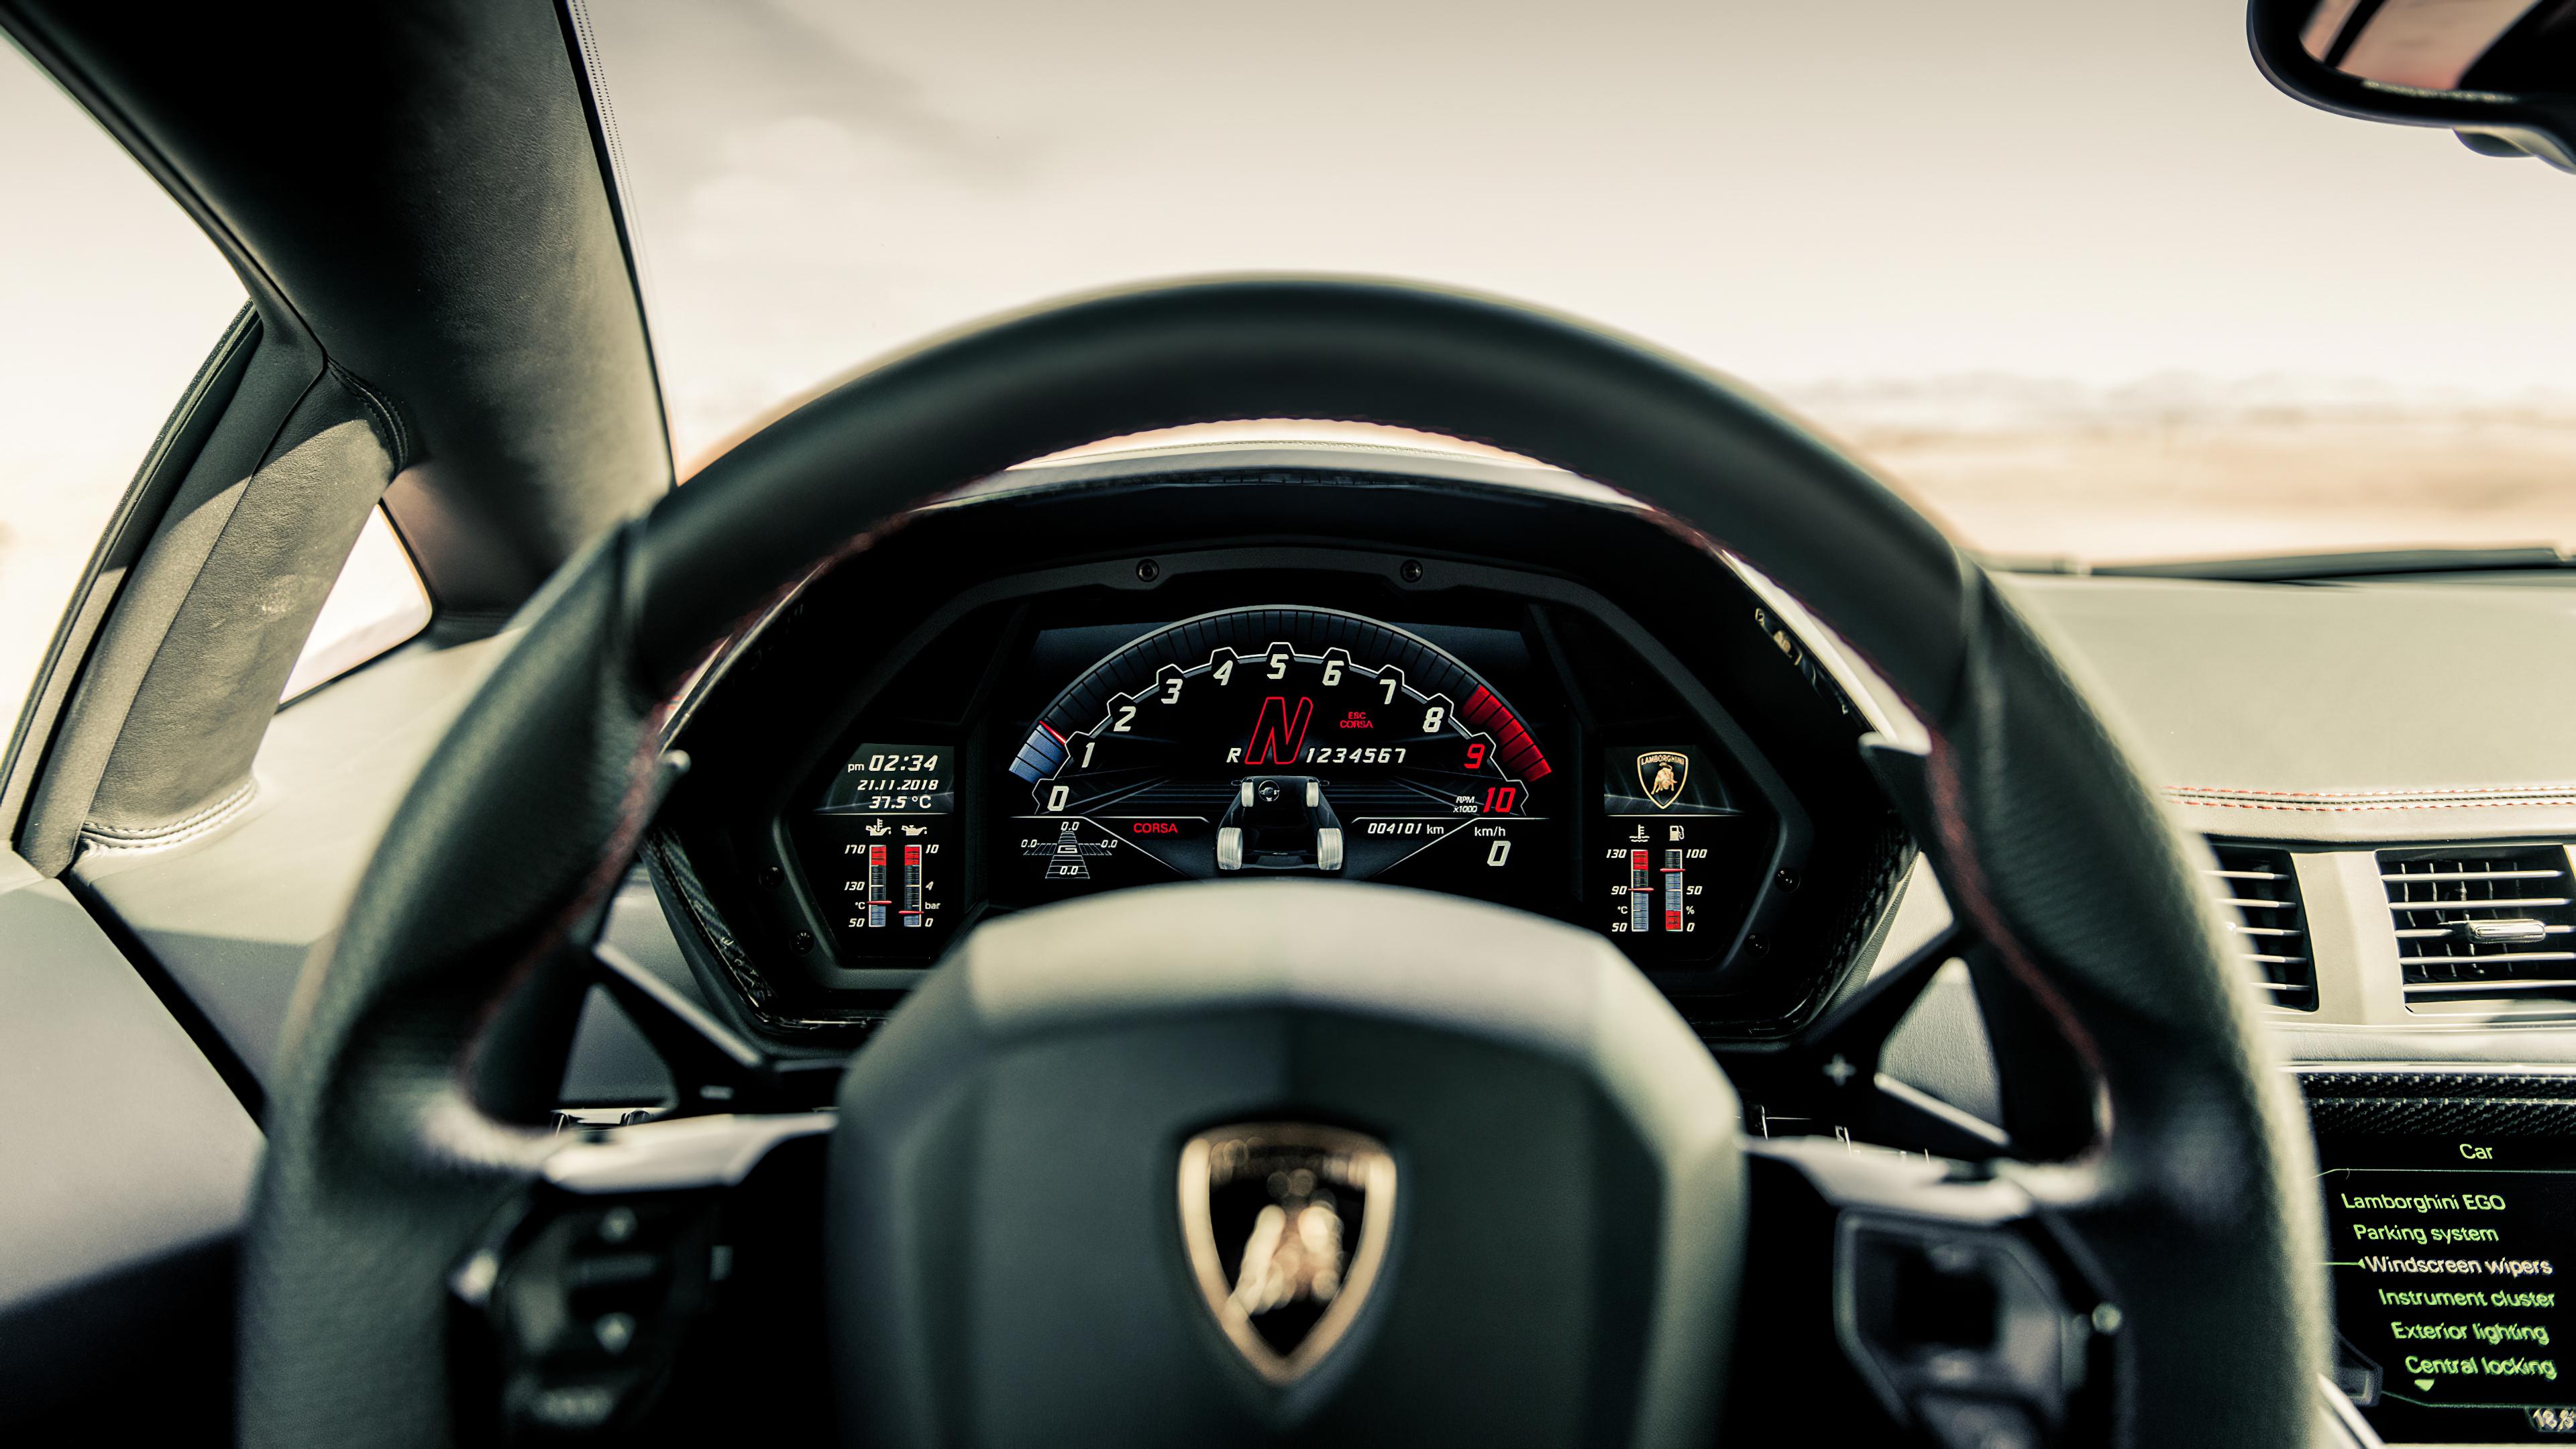 lamborghini aventador s roadster 2020 hud 1579649271 - Lamborghini Aventador S Roadster 2020 Hud -